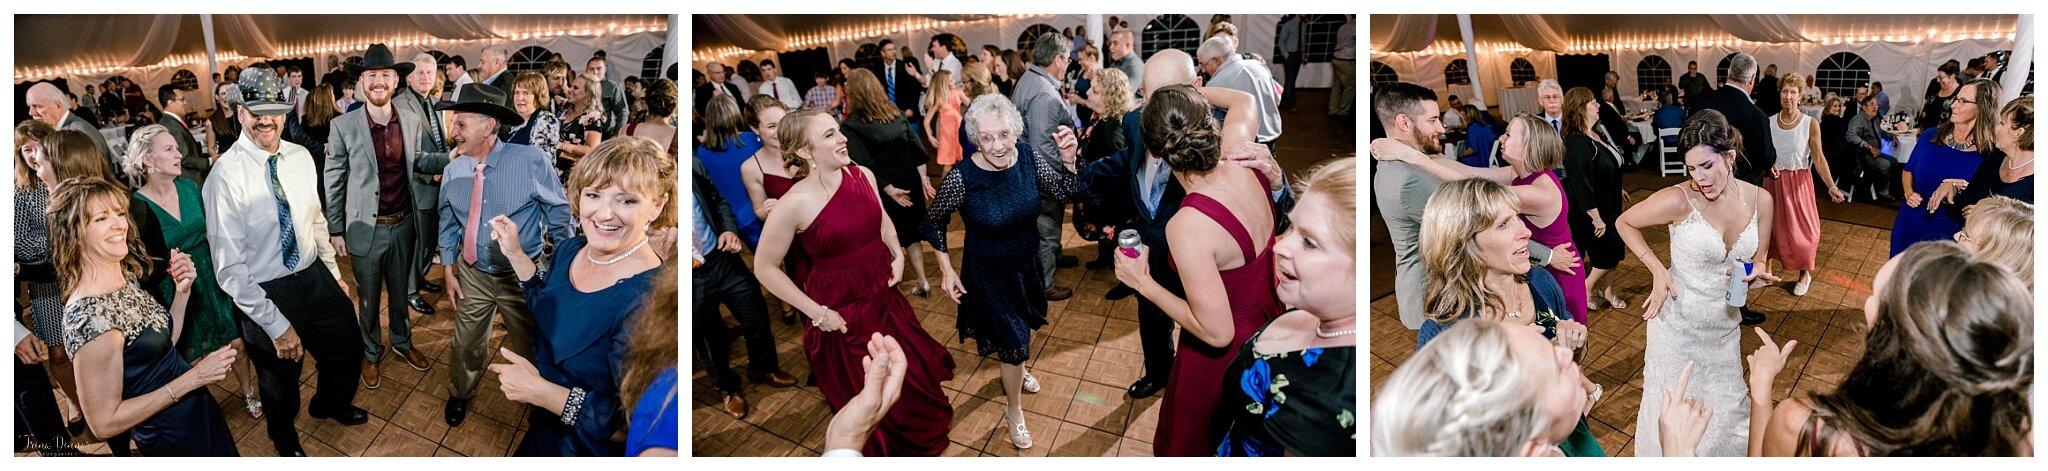 Reception Dancing during Wedding